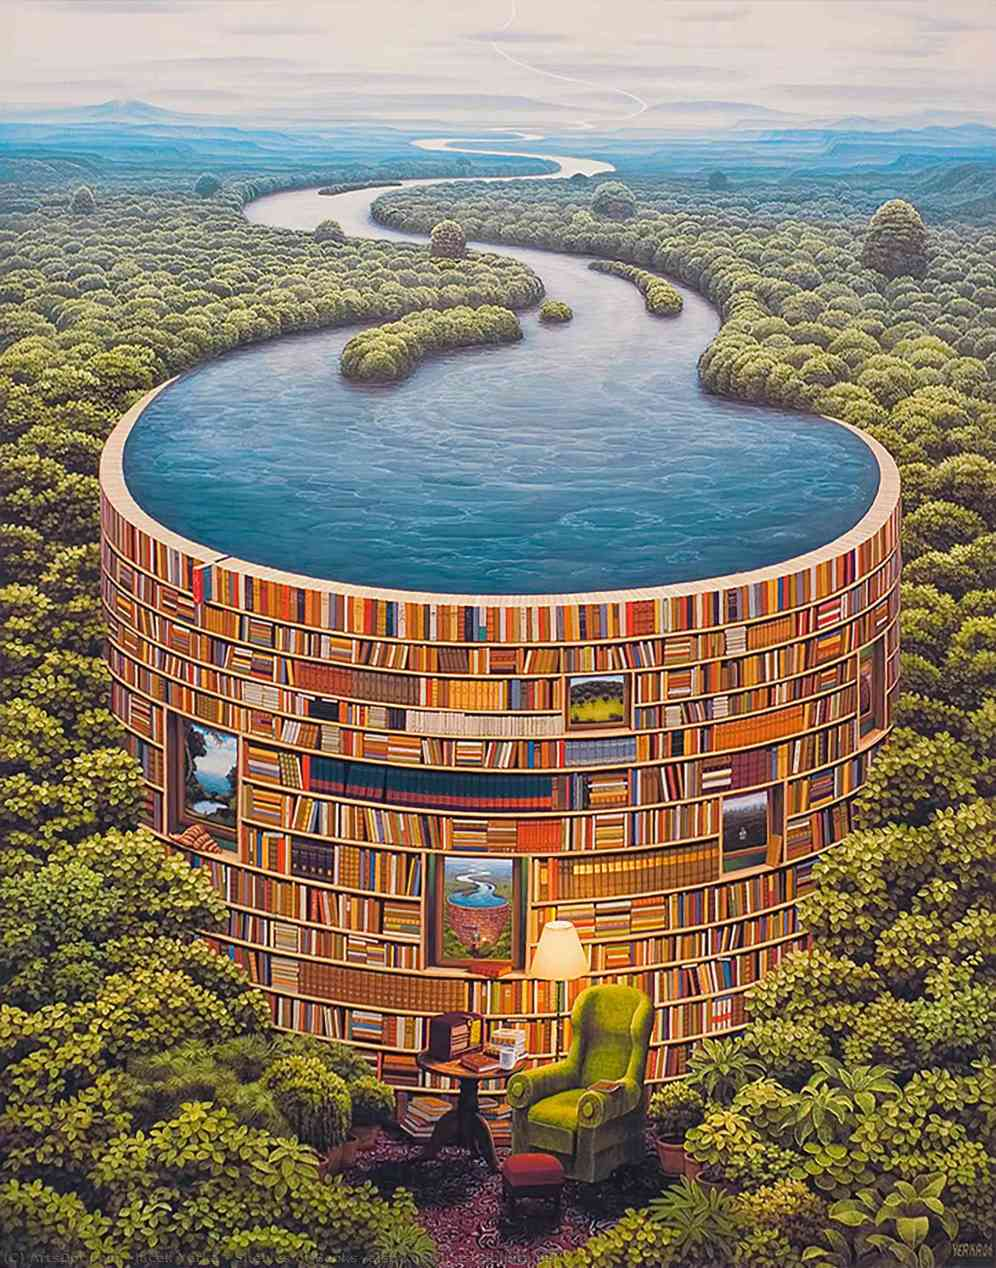 Jacek-yerka-shelves-of-books-also-known-as-bibliotama-